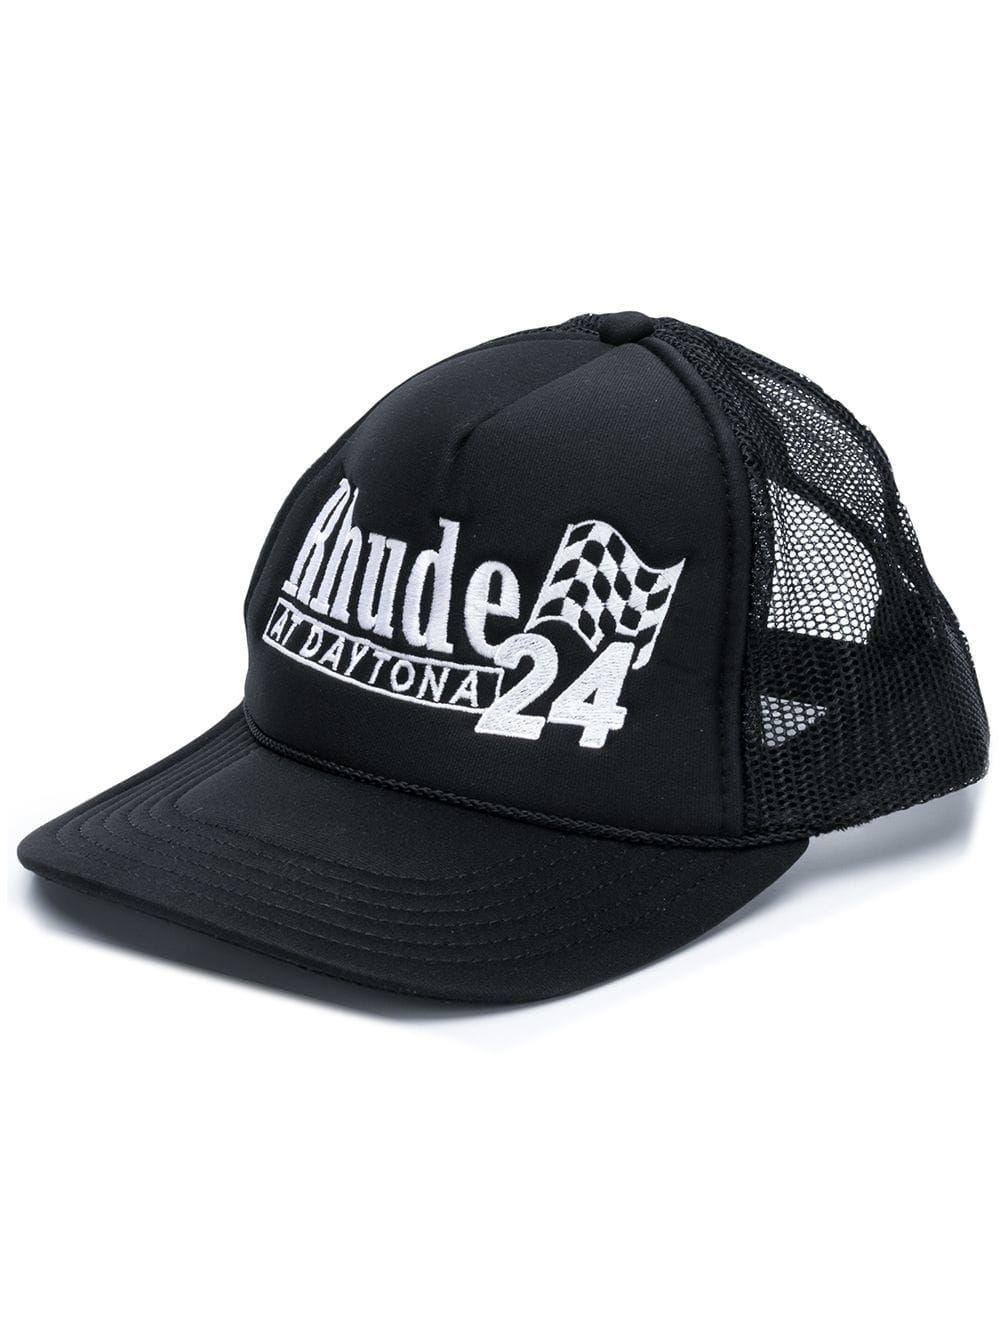 RHUDE RHUDE LOGO EMBROIDERED CAP - BLACK.  rhude  5de1d7653e1c